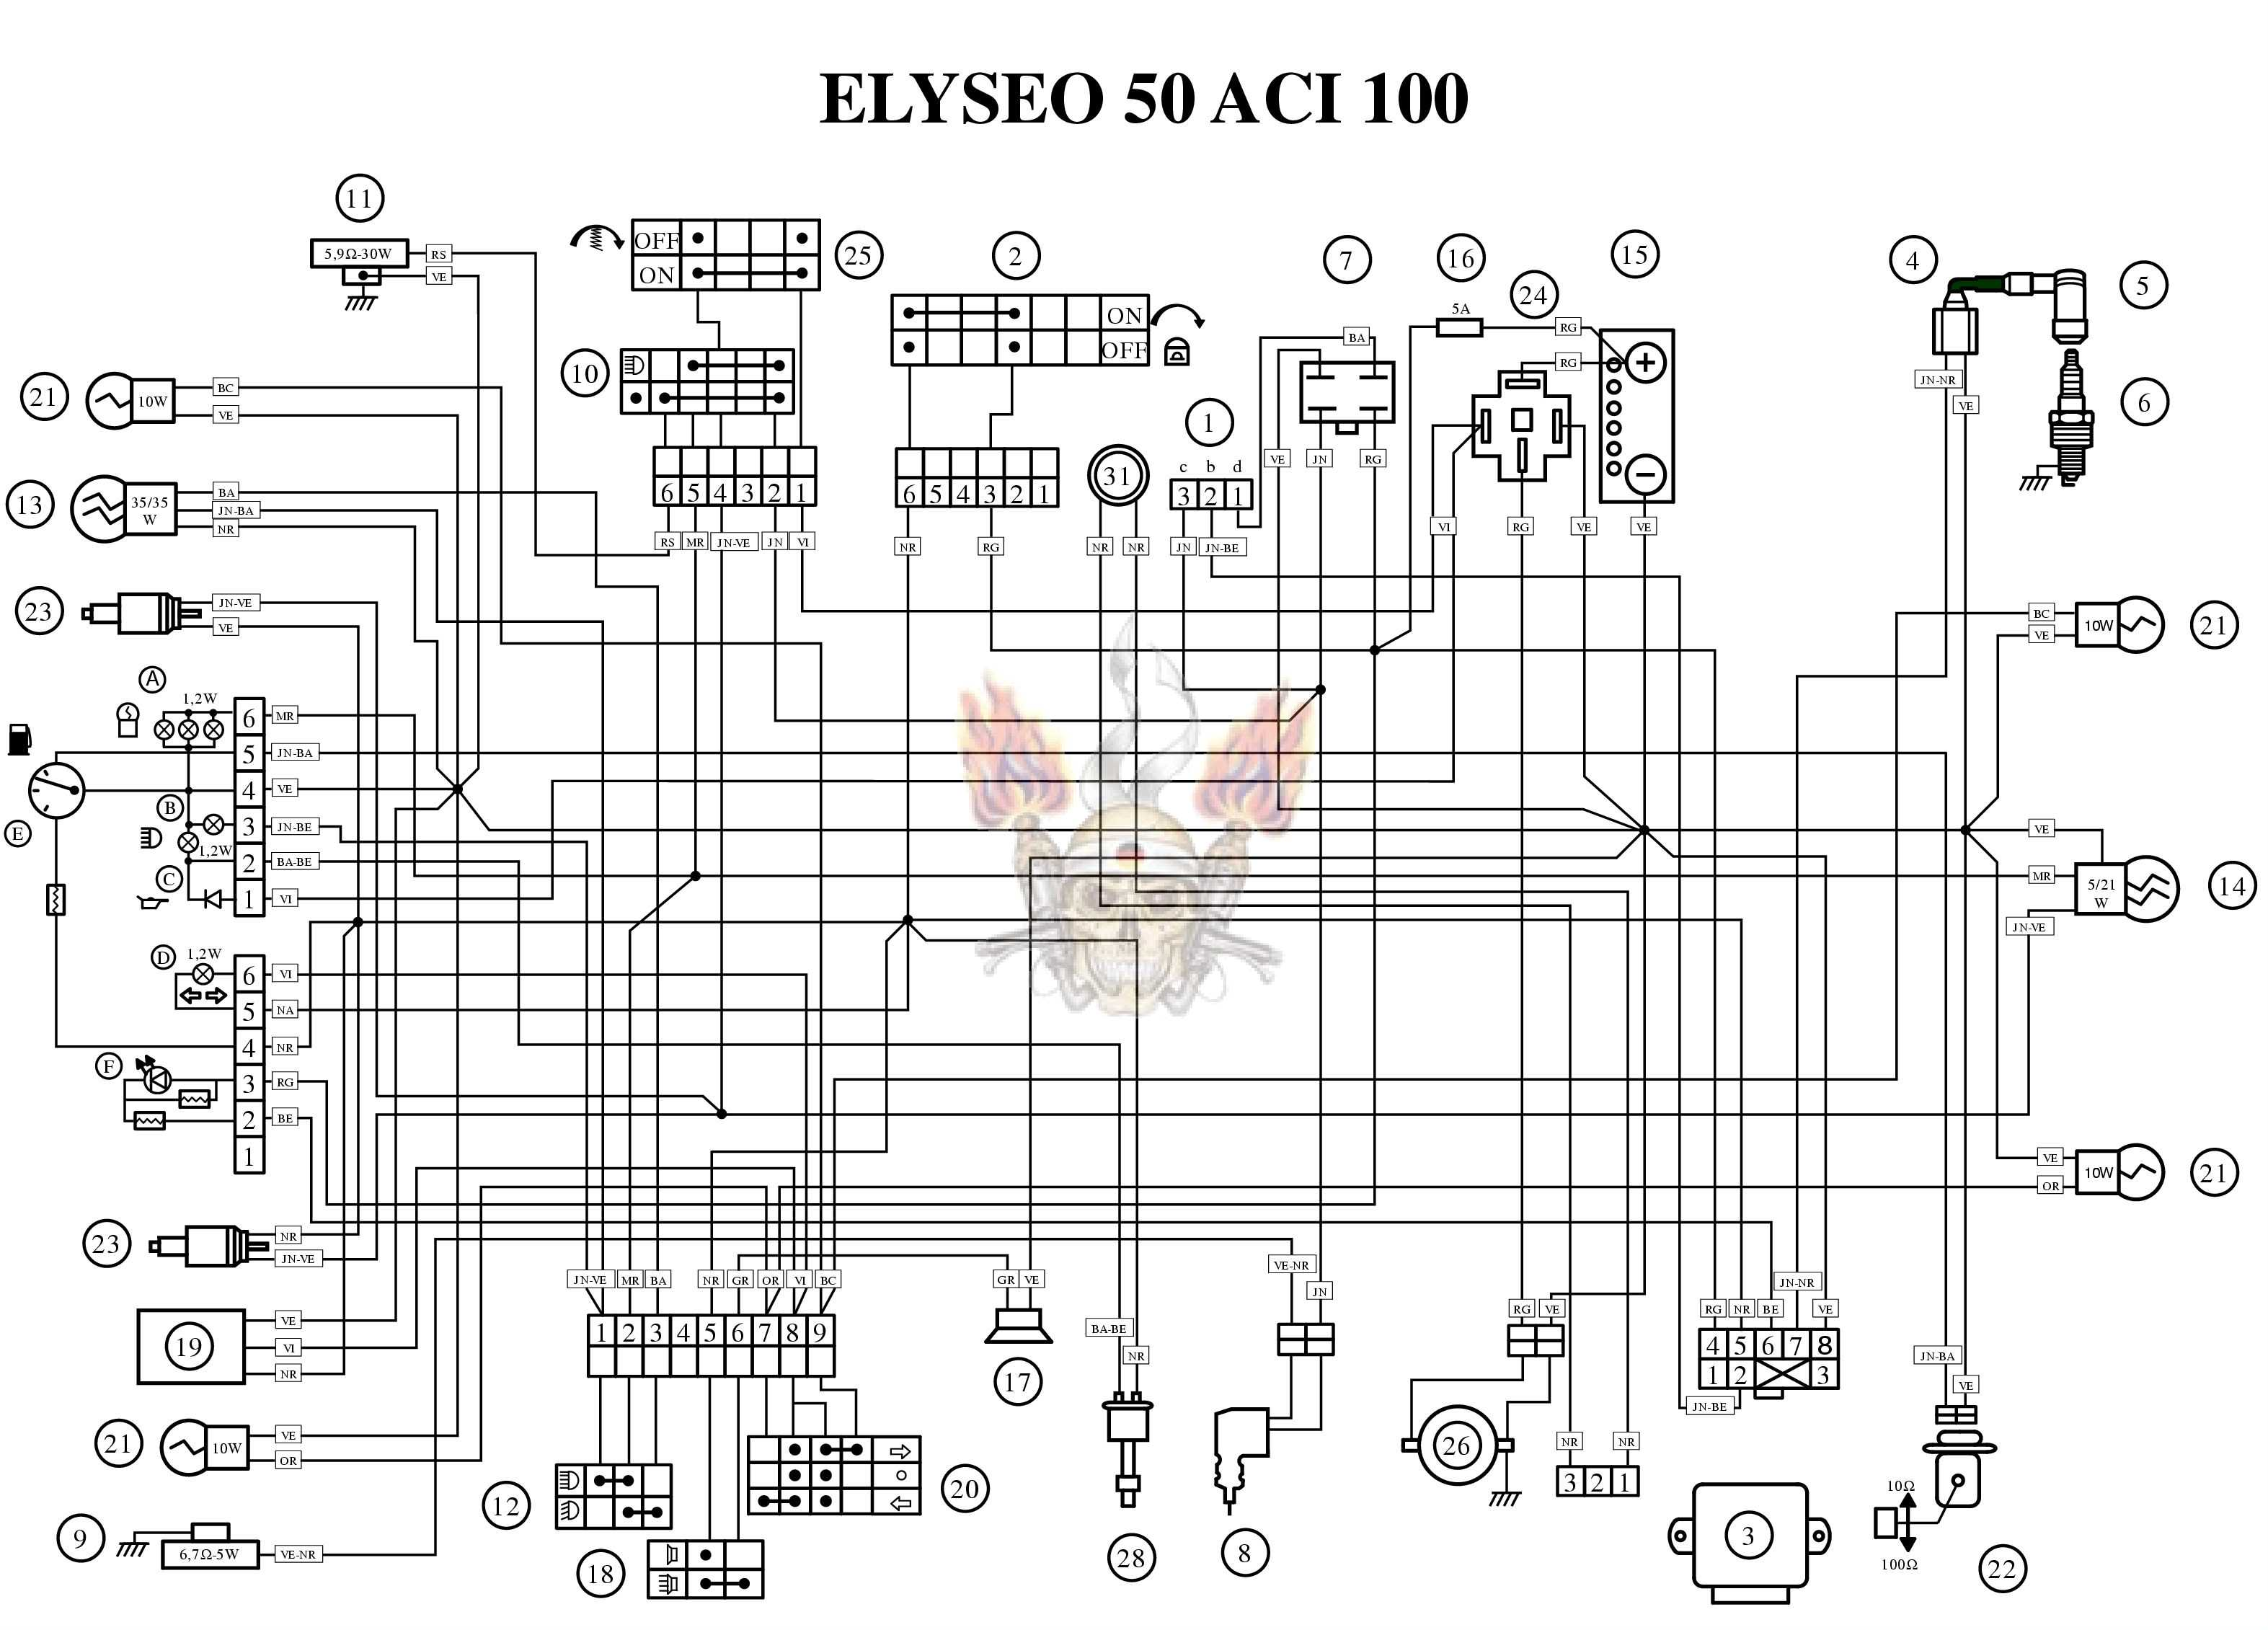 Peugeot Motorcycles Manual Pdf Wiring Diagram Fault Codes